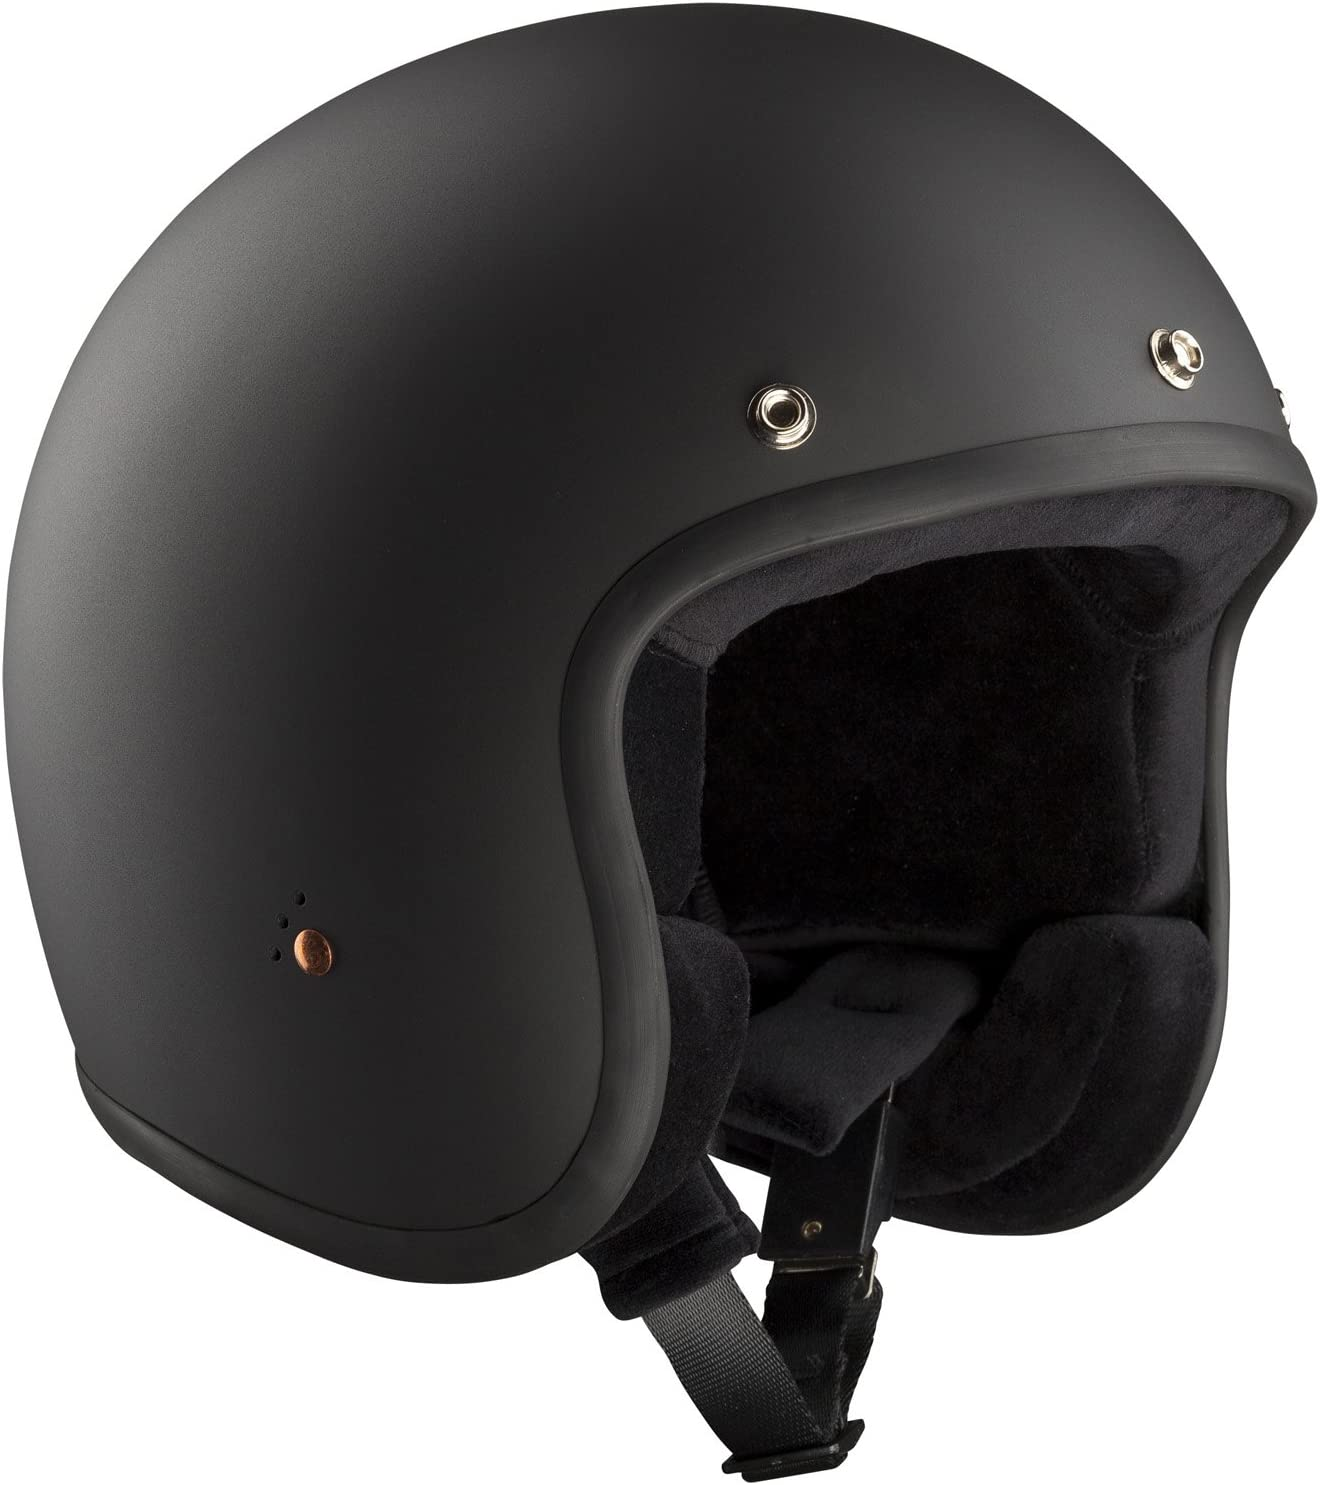 Casco jet Bandit helmets